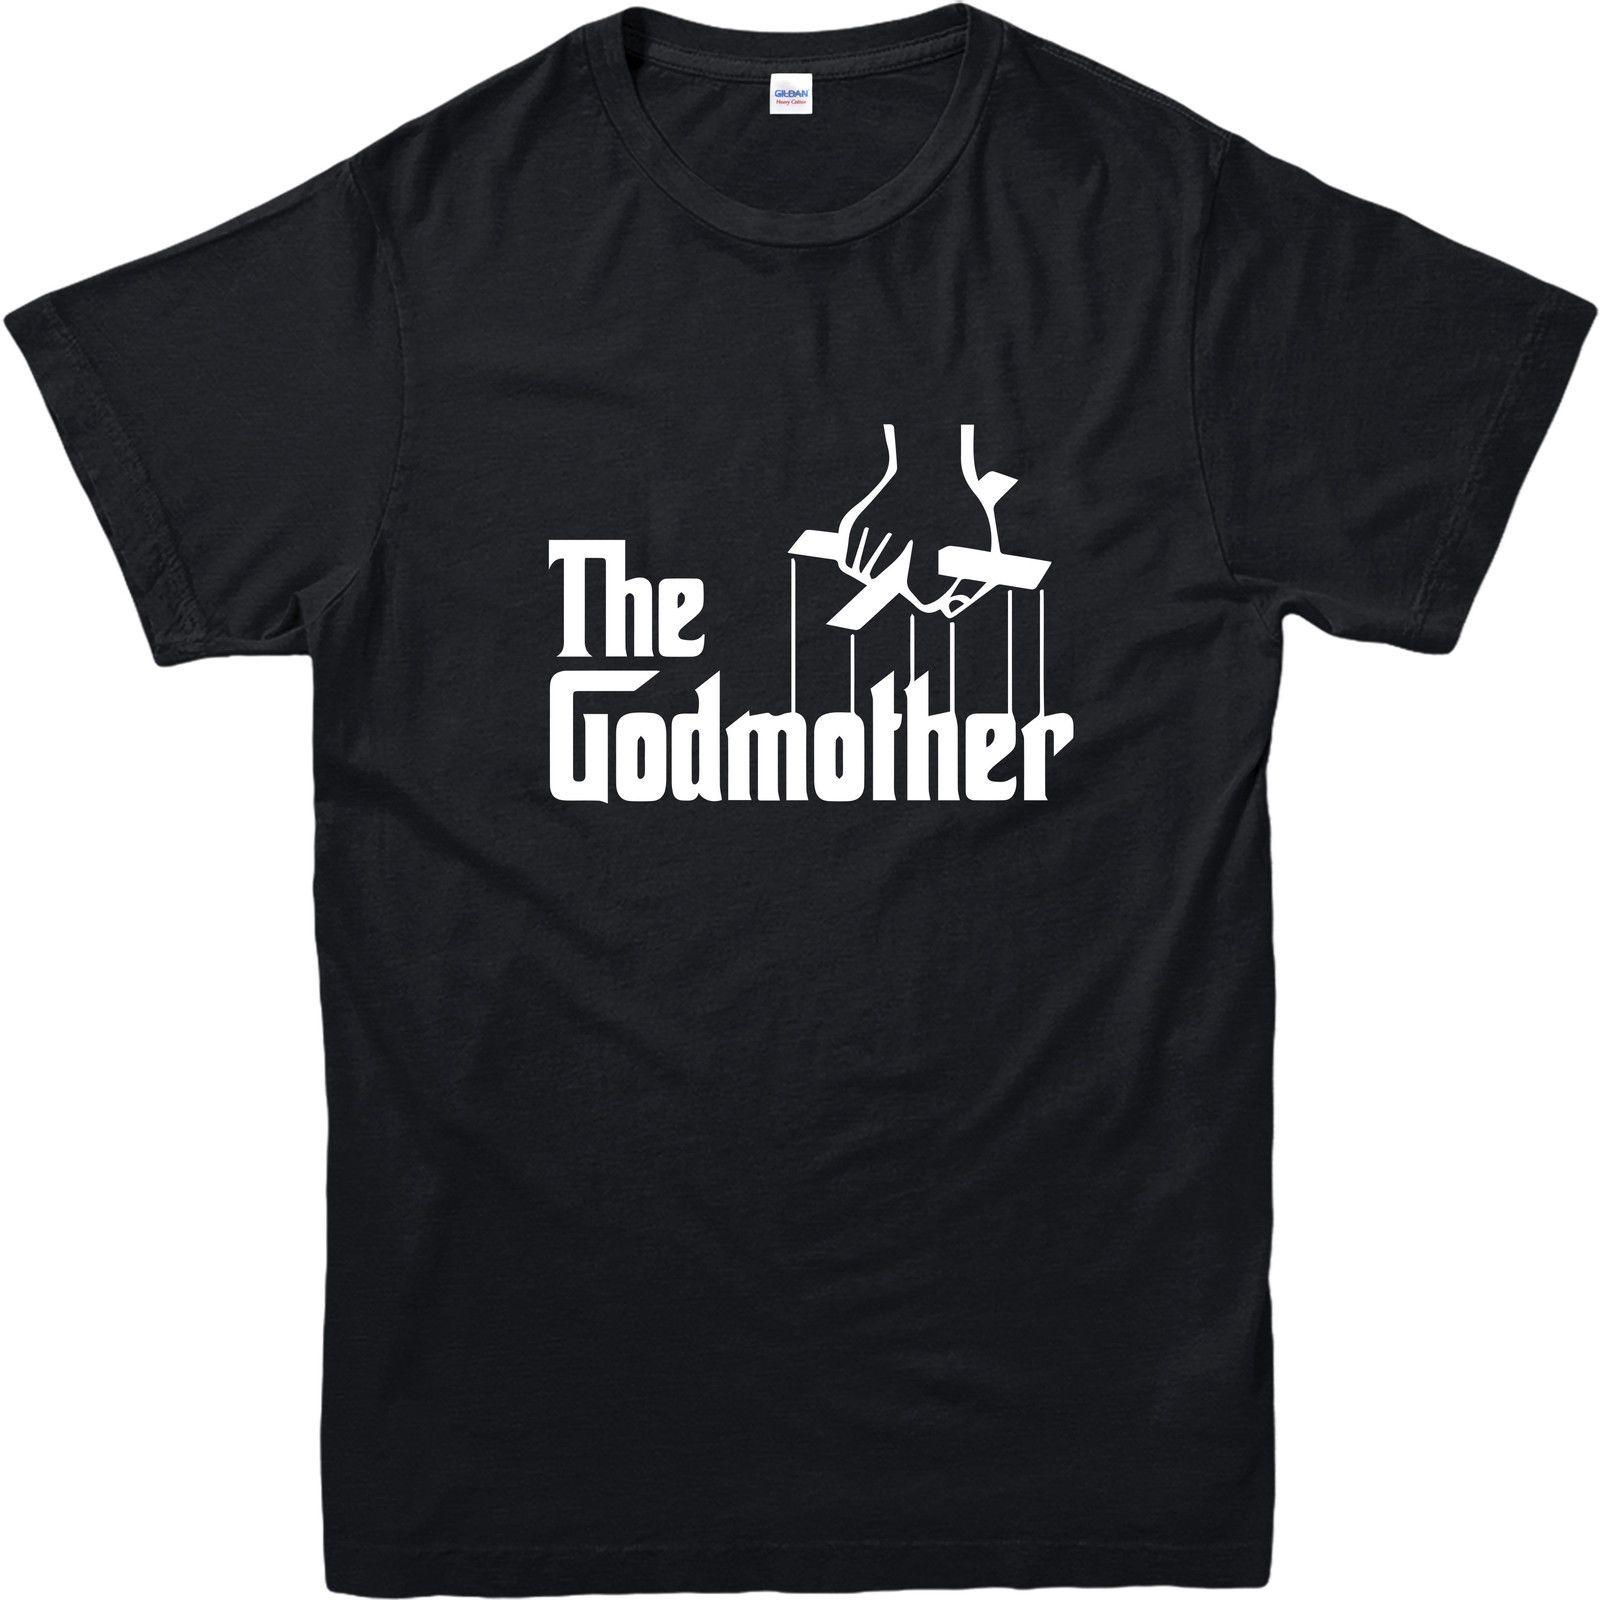 The Godmother Shirt Funny Godfather Parody Tee